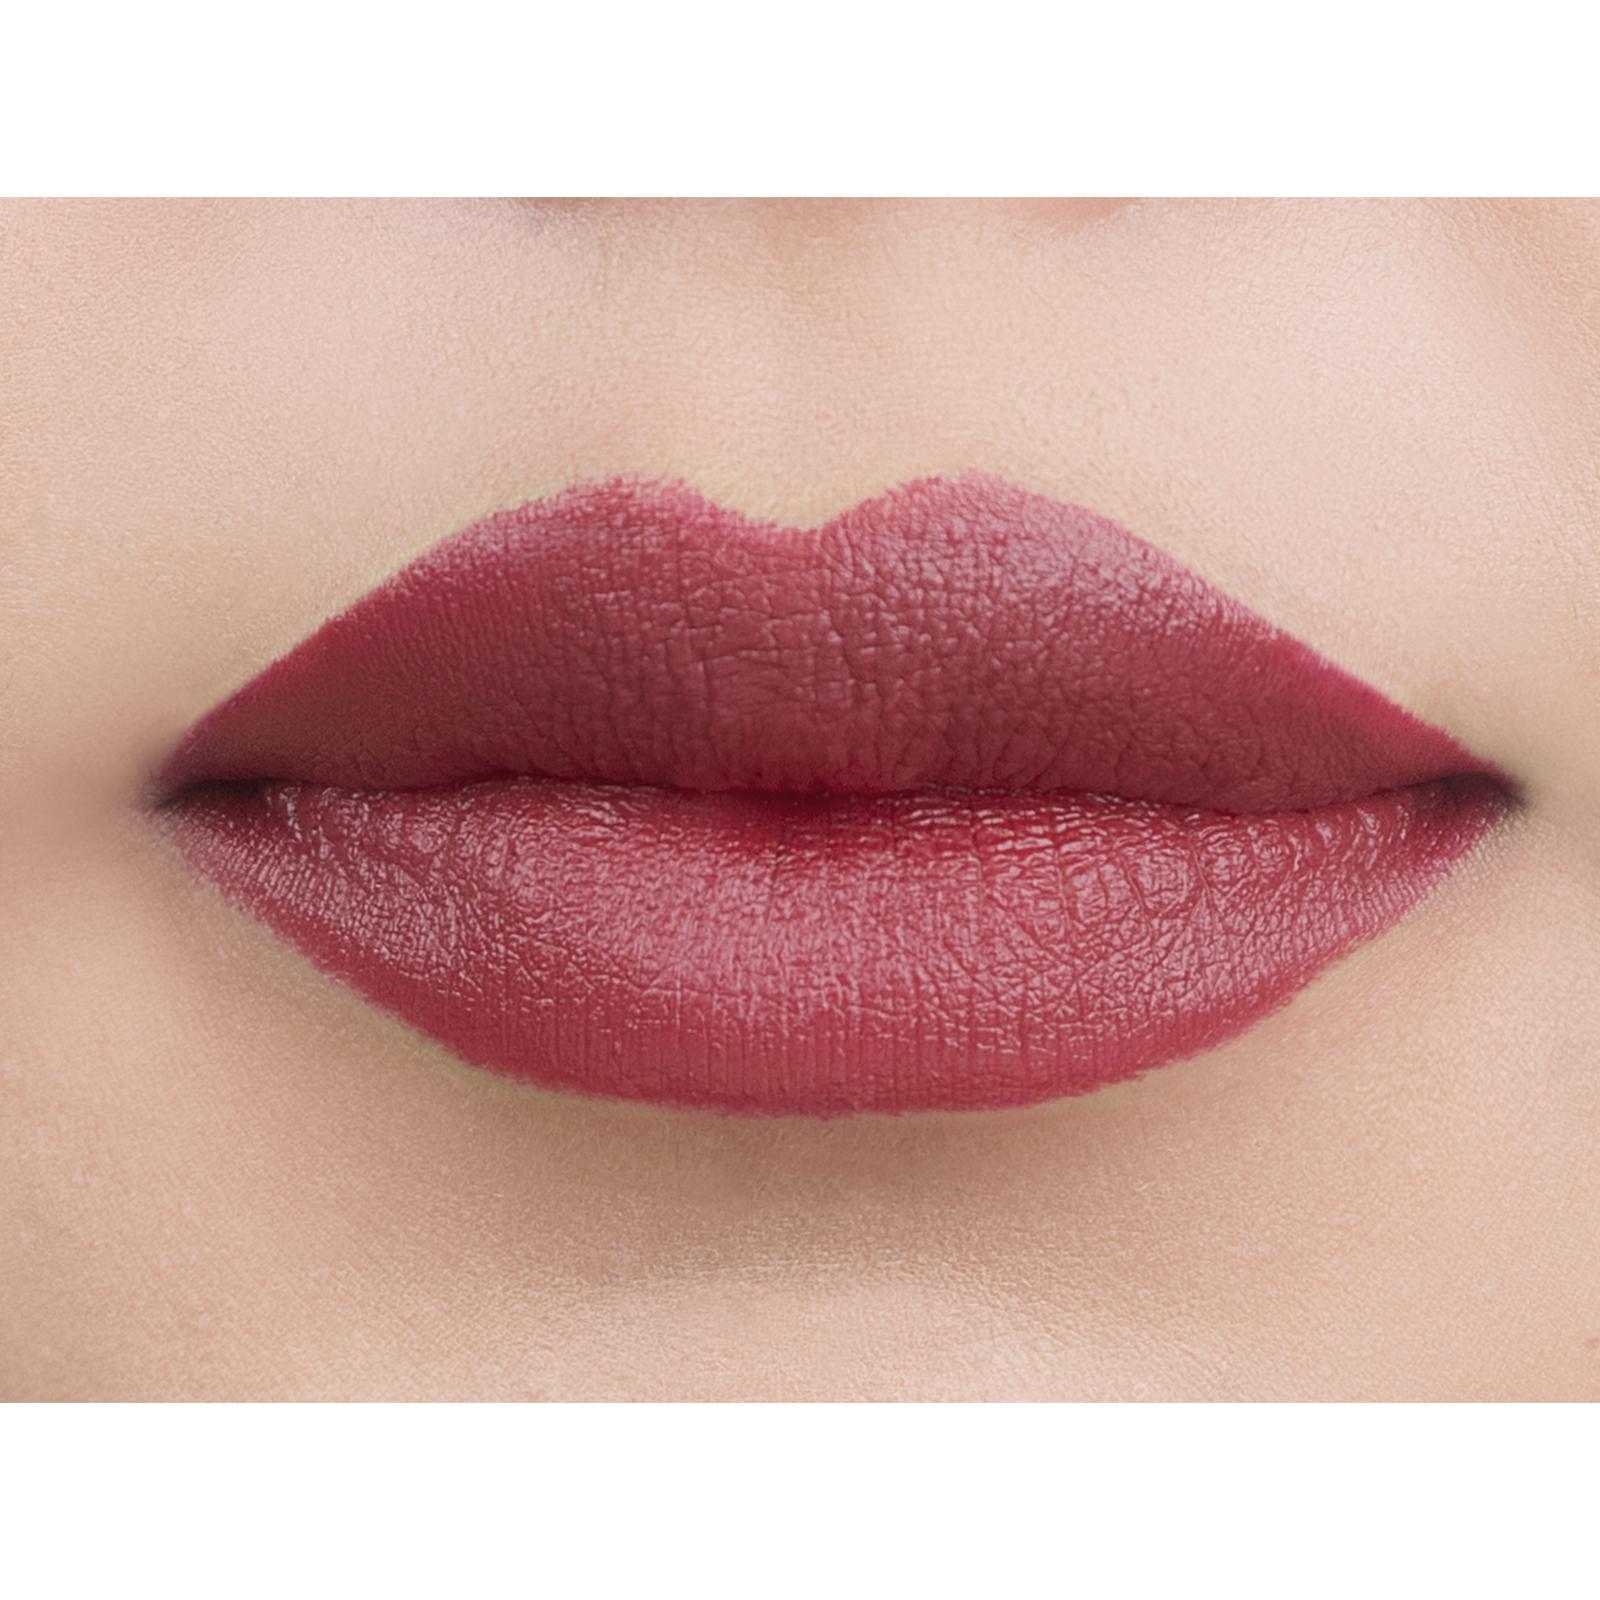 Shop the Blog - Defiant Creamy Lipsticks